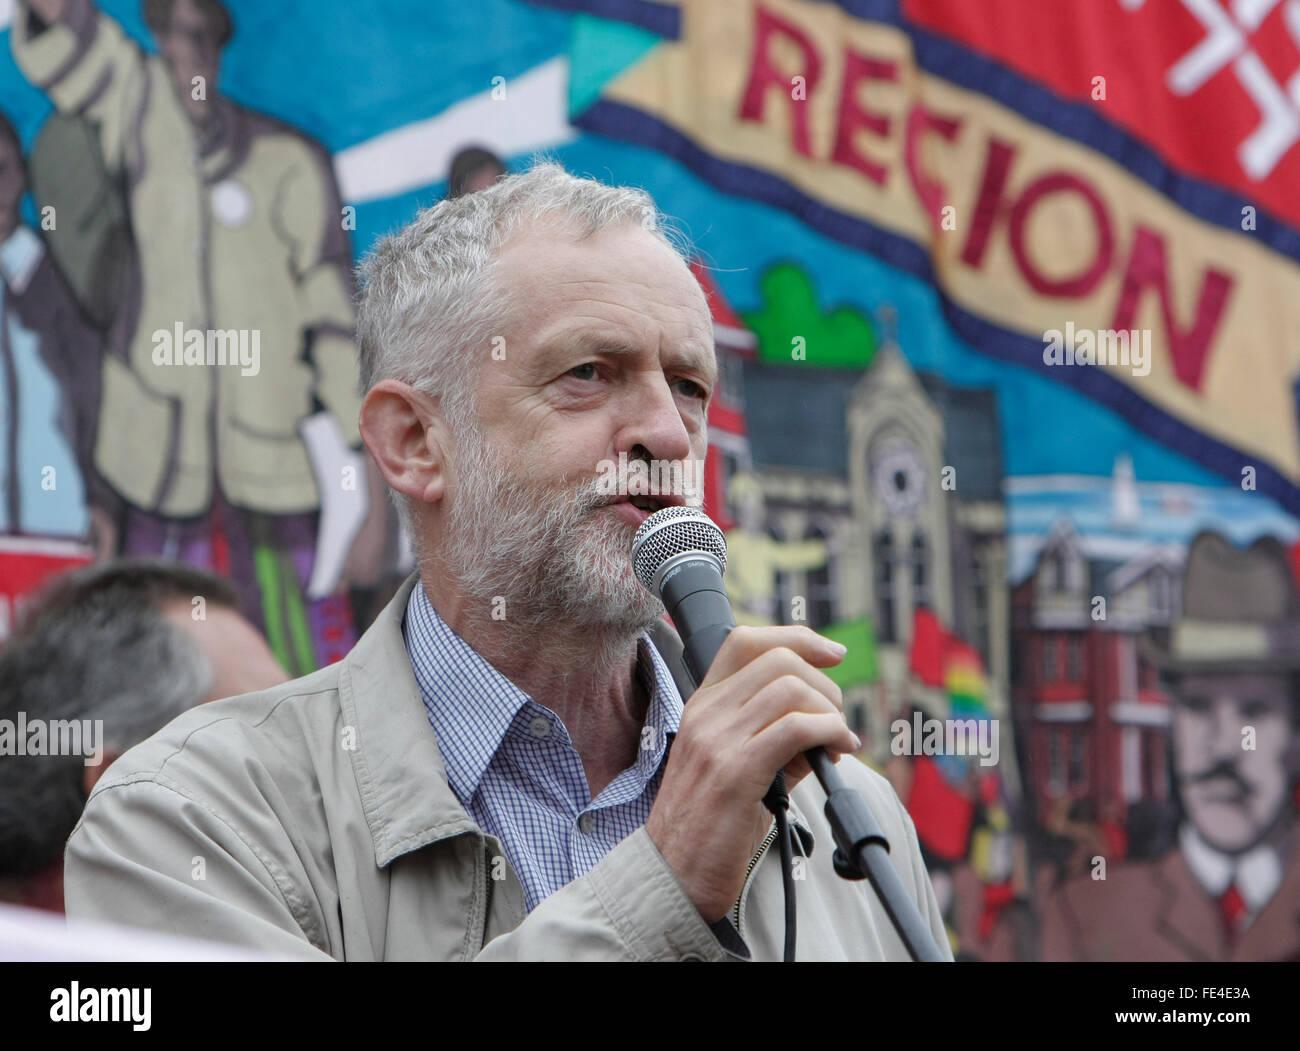 Jeremy Corbyn speaks at the anti austerity rally in trafalgar square, London, UK, 10/7/2014. - Stock Image